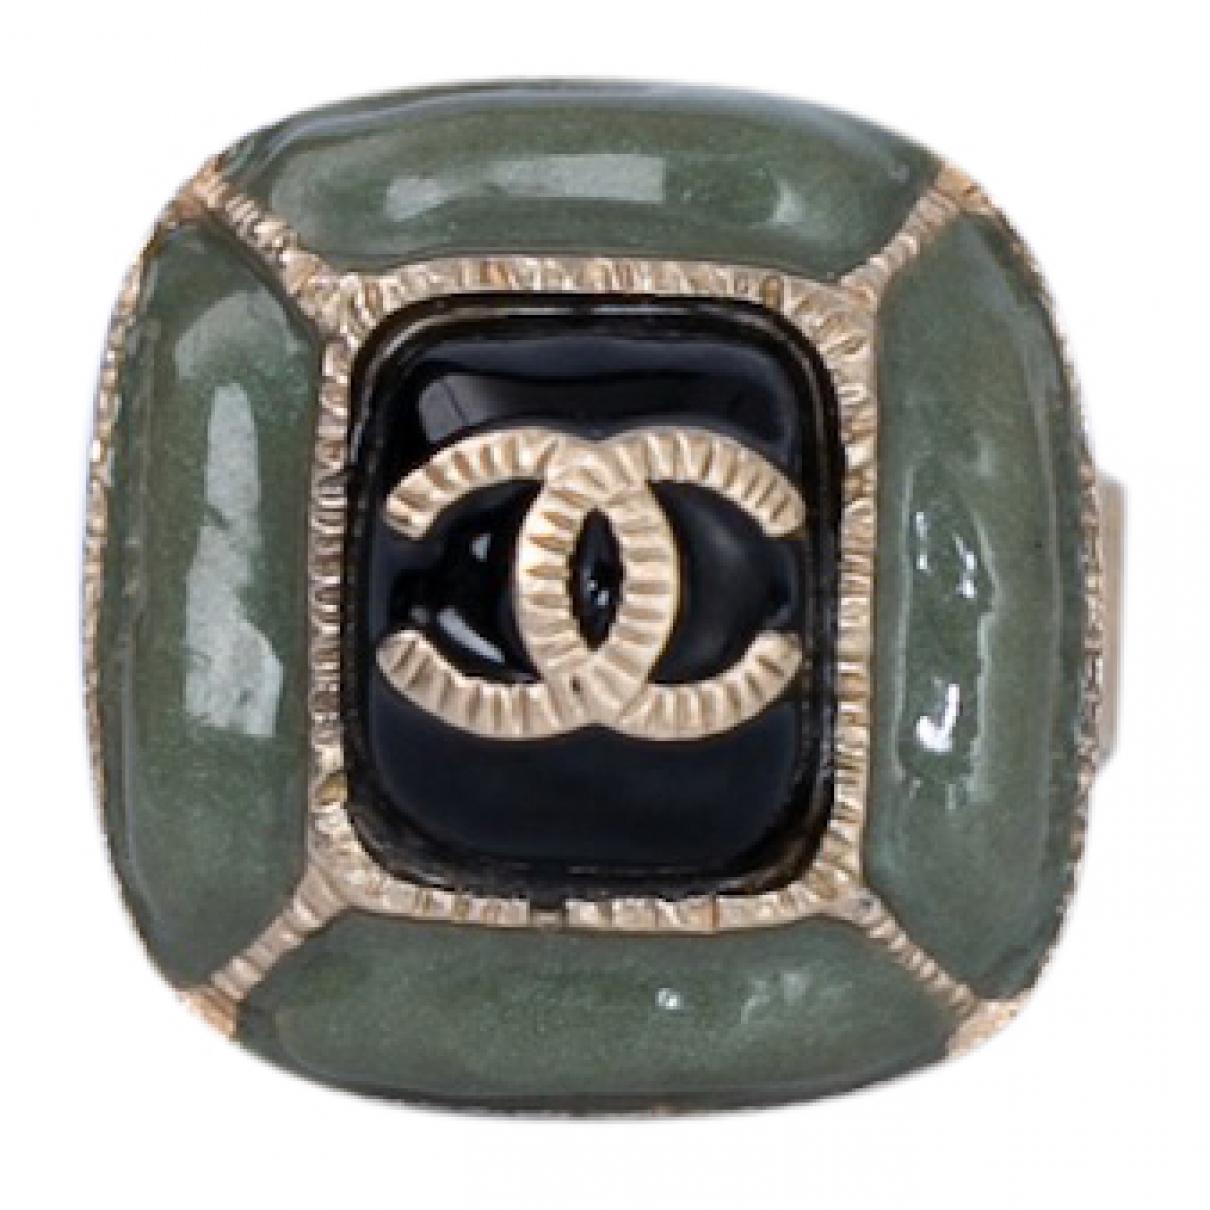 Chanel CC Ring in  Gruen Metall